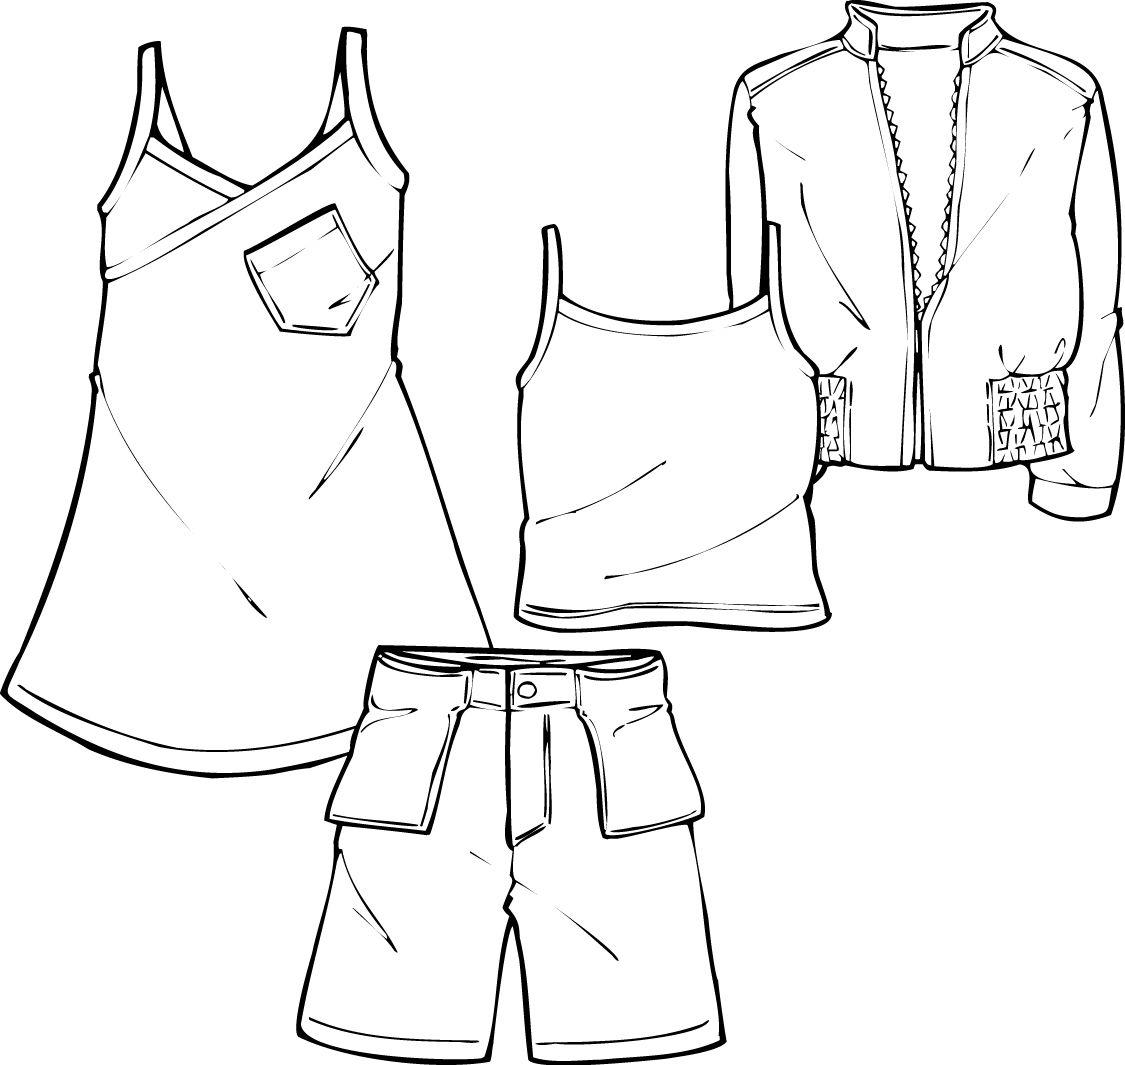 Croquis robe pour fille | fashion sketches | Pinterest